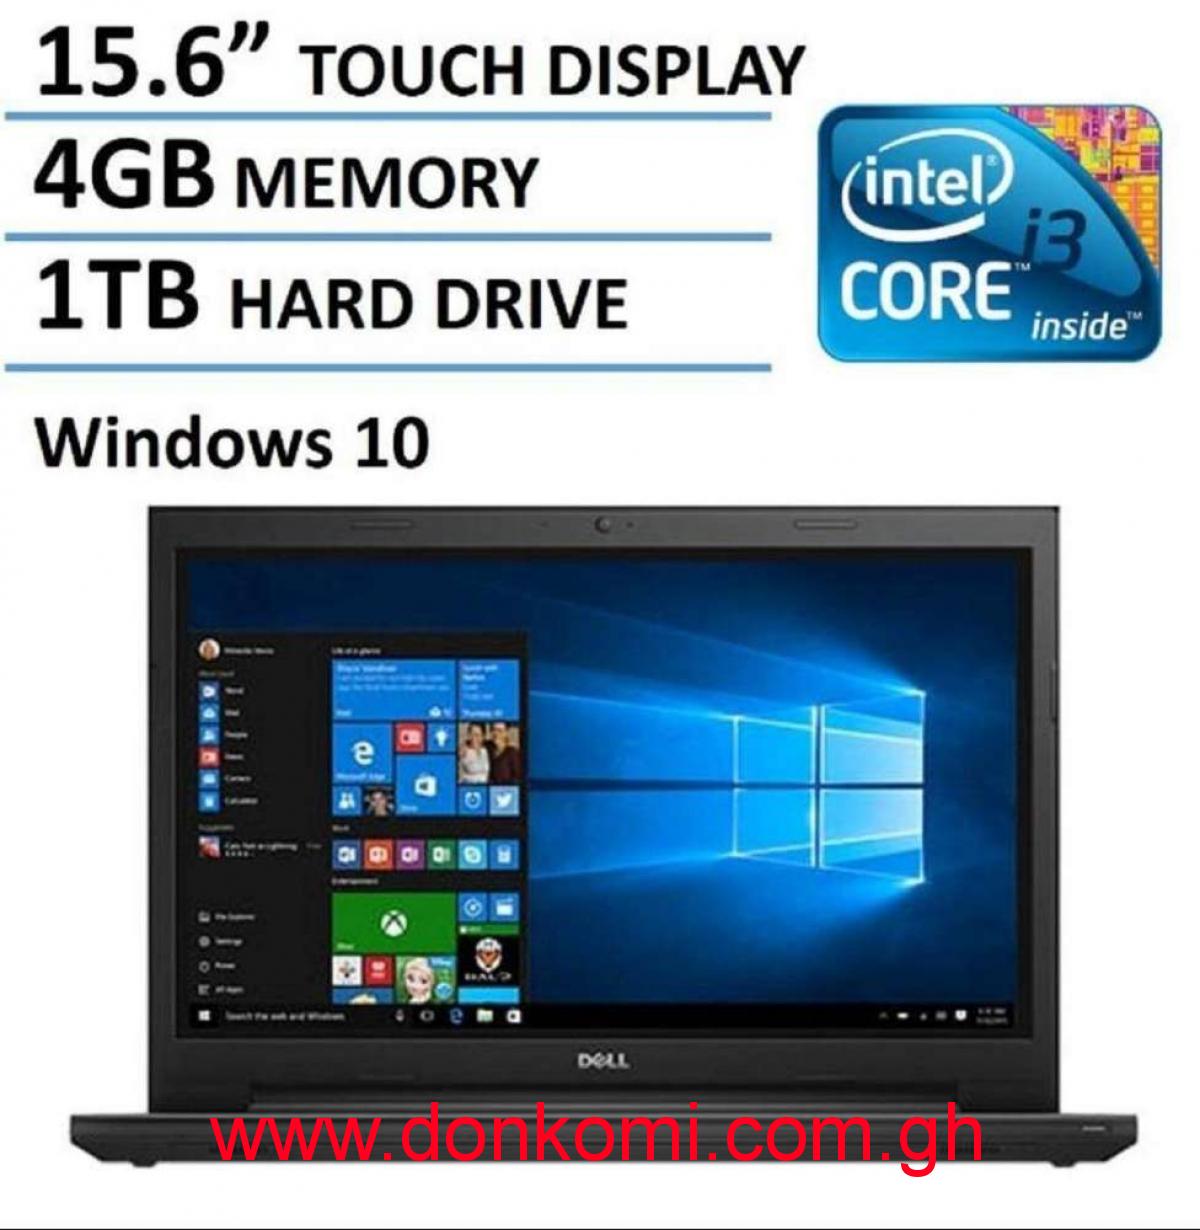 Dell inspiron 15.6 Touchscreen